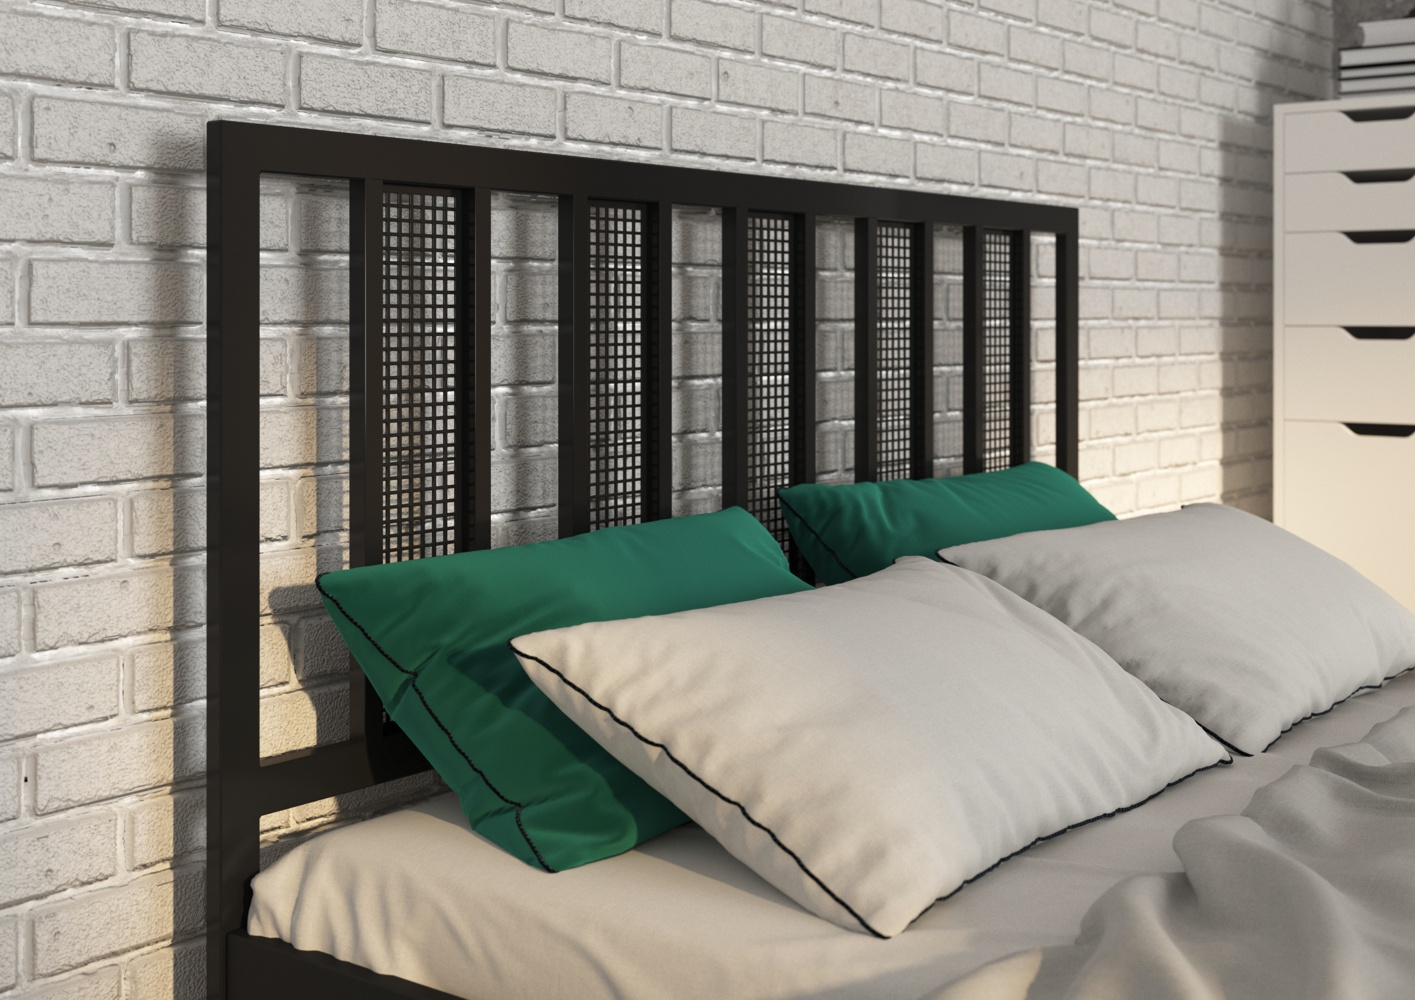 Łóżko metalowe Rio (wzór 16) (140-180 cm)